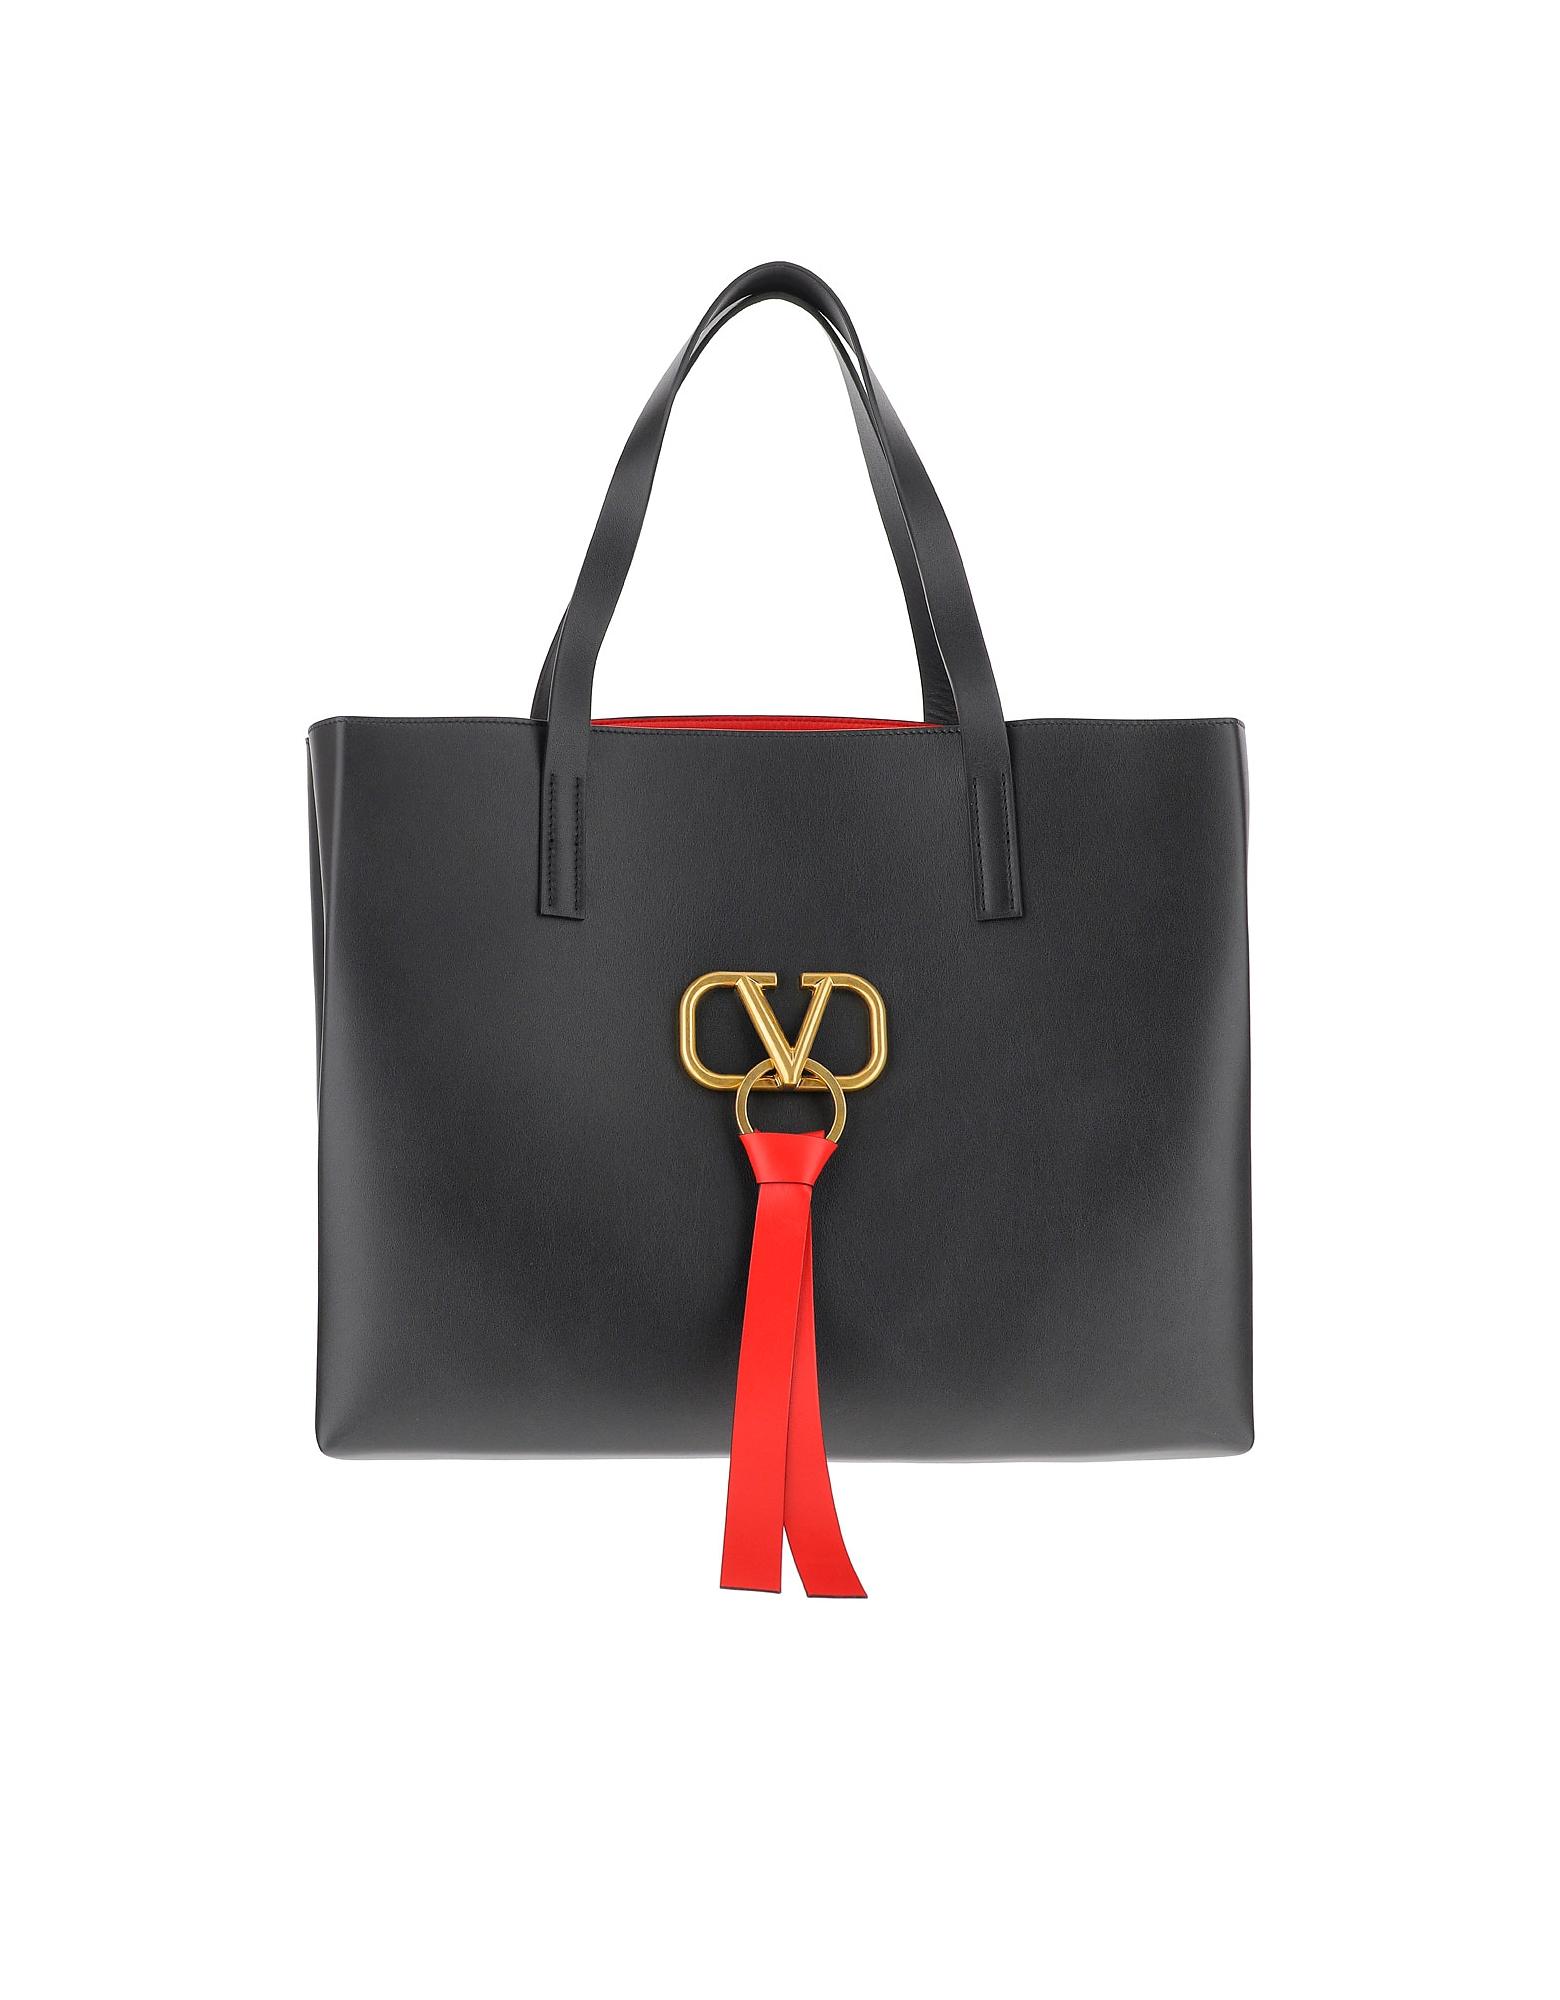 Valentino Designer Handbags, V-Ring Black Leather Tote Bag